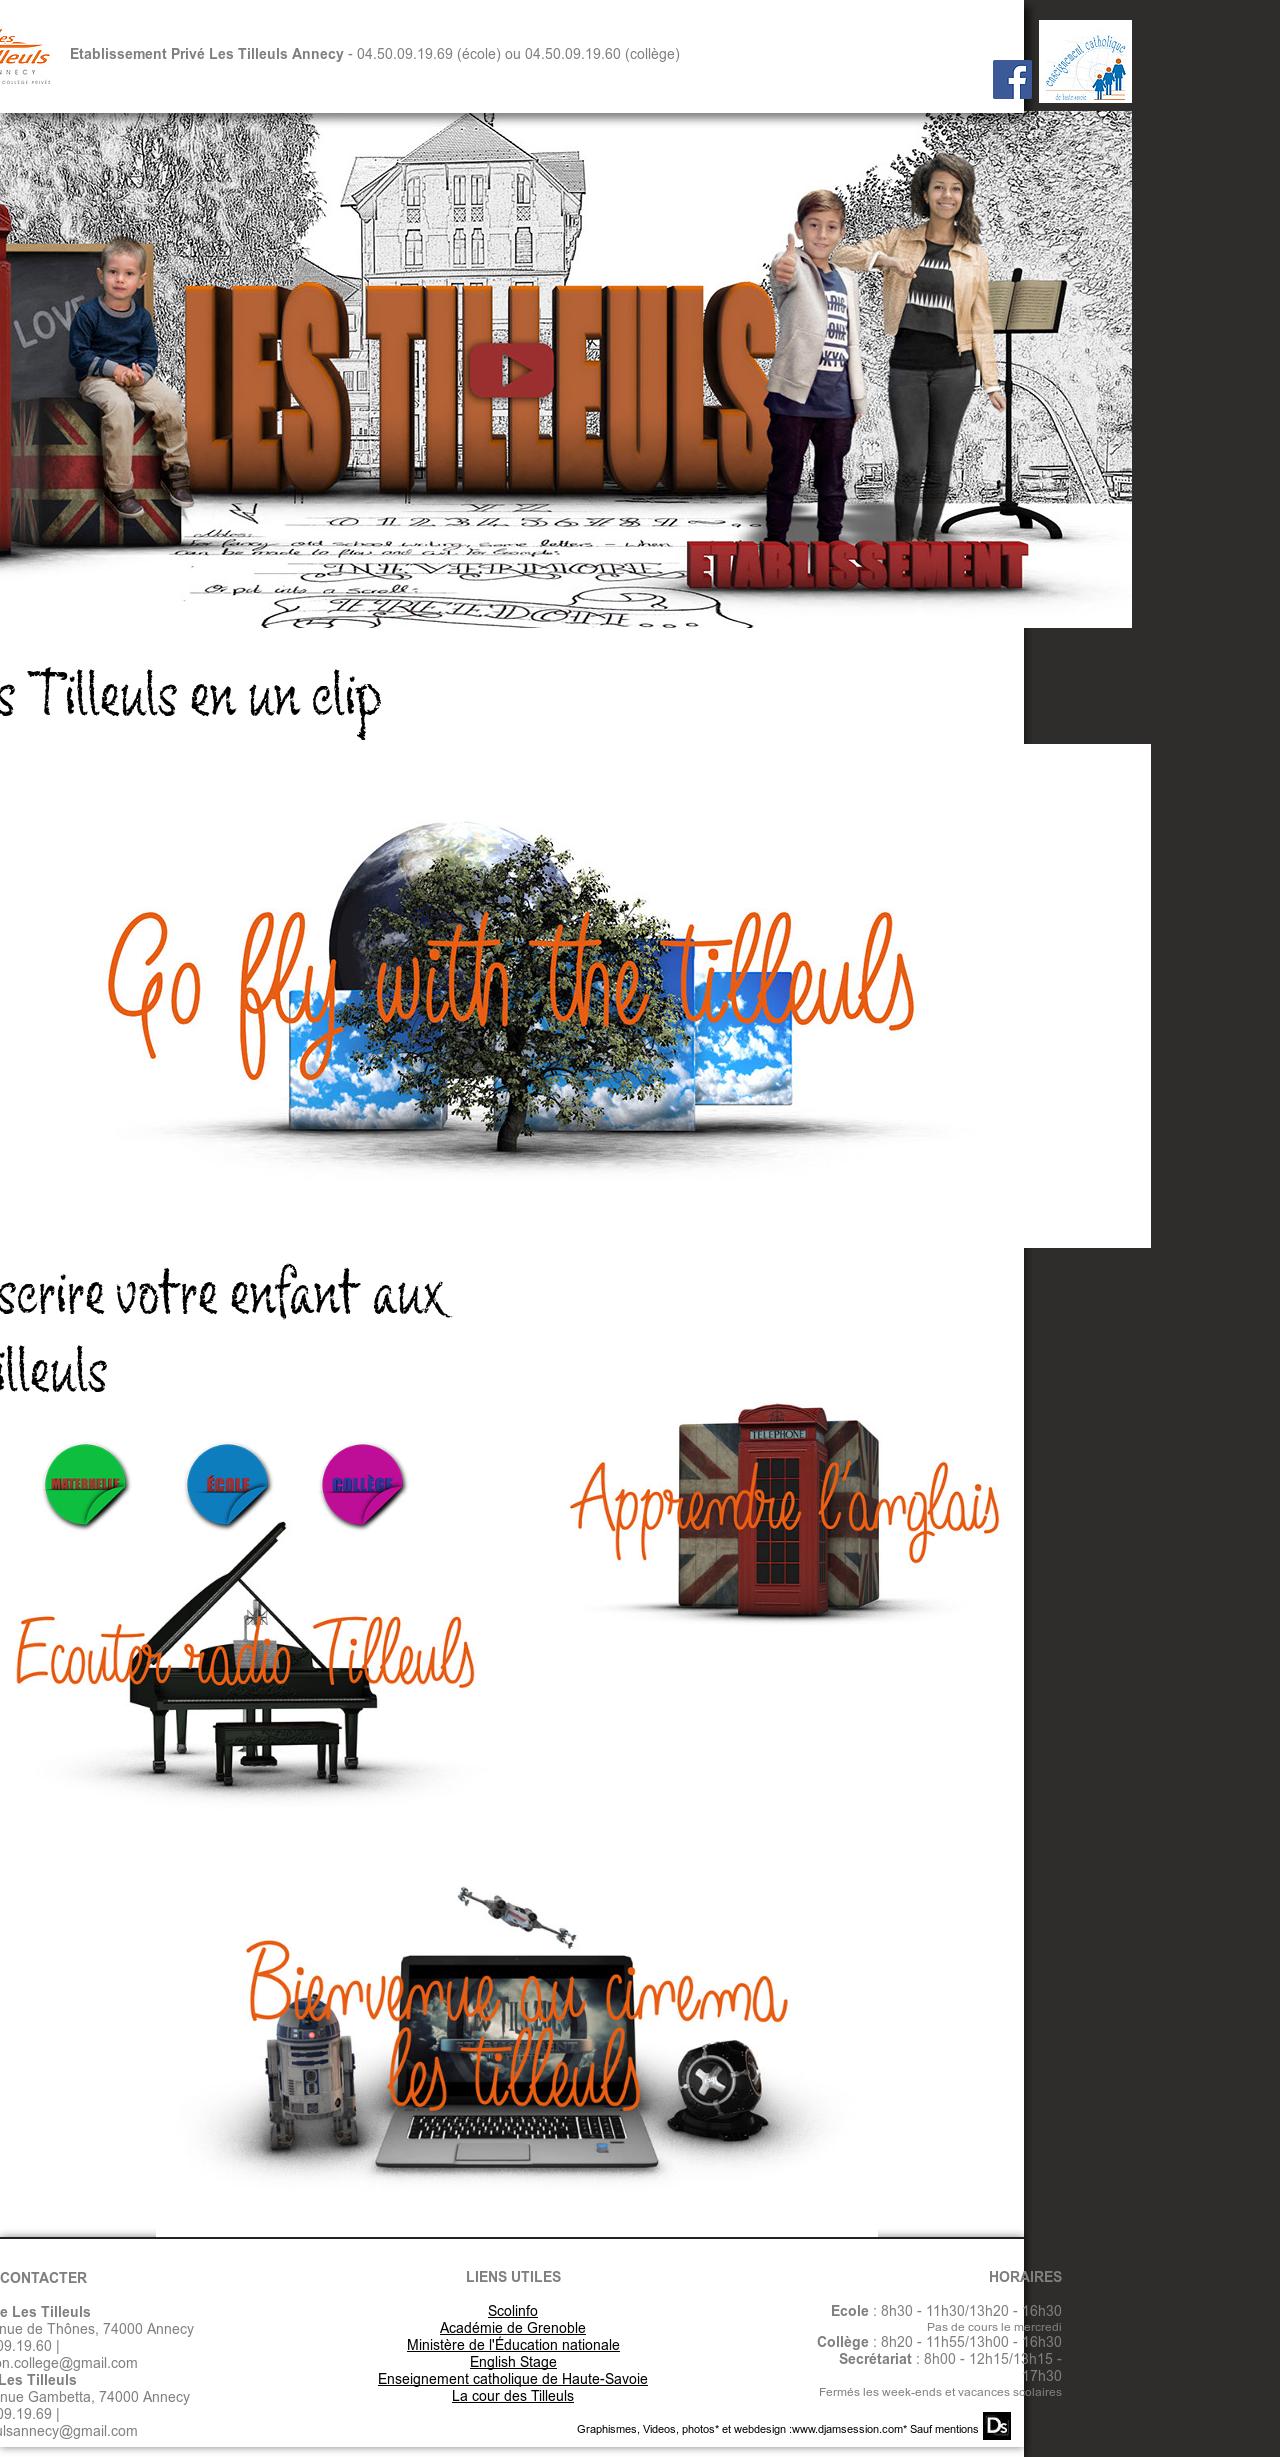 Ecole De Design Annecy les tilleuls annecy competitors, revenue and employees